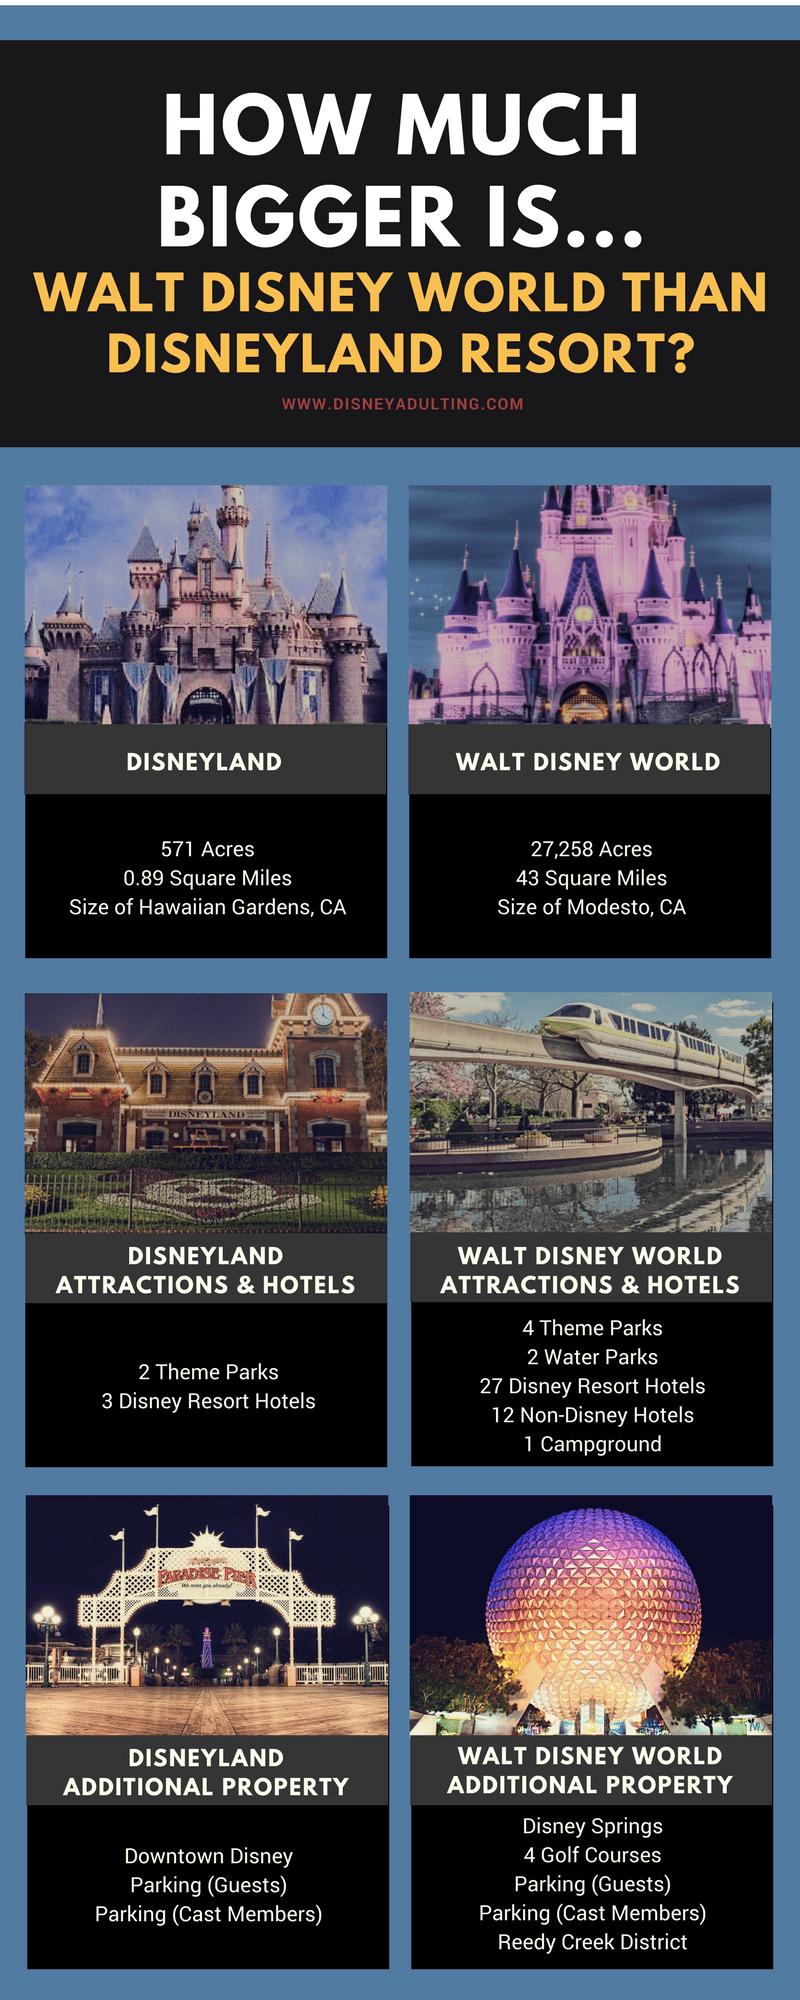 How much bigger is Walt Disney World than Disneyland?